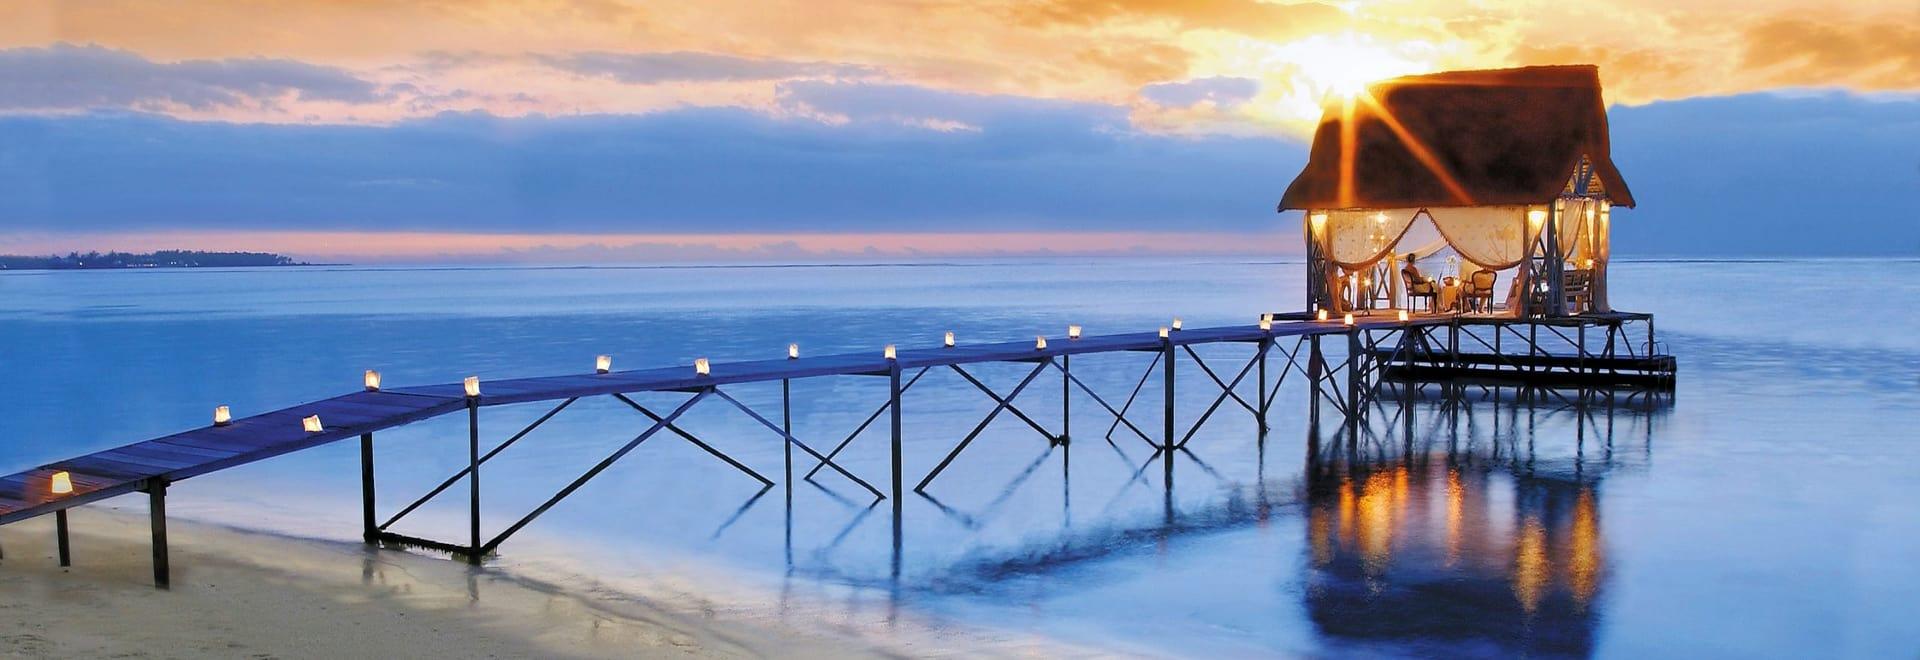 1464187455_mauritius-tourist-places-image.jpg